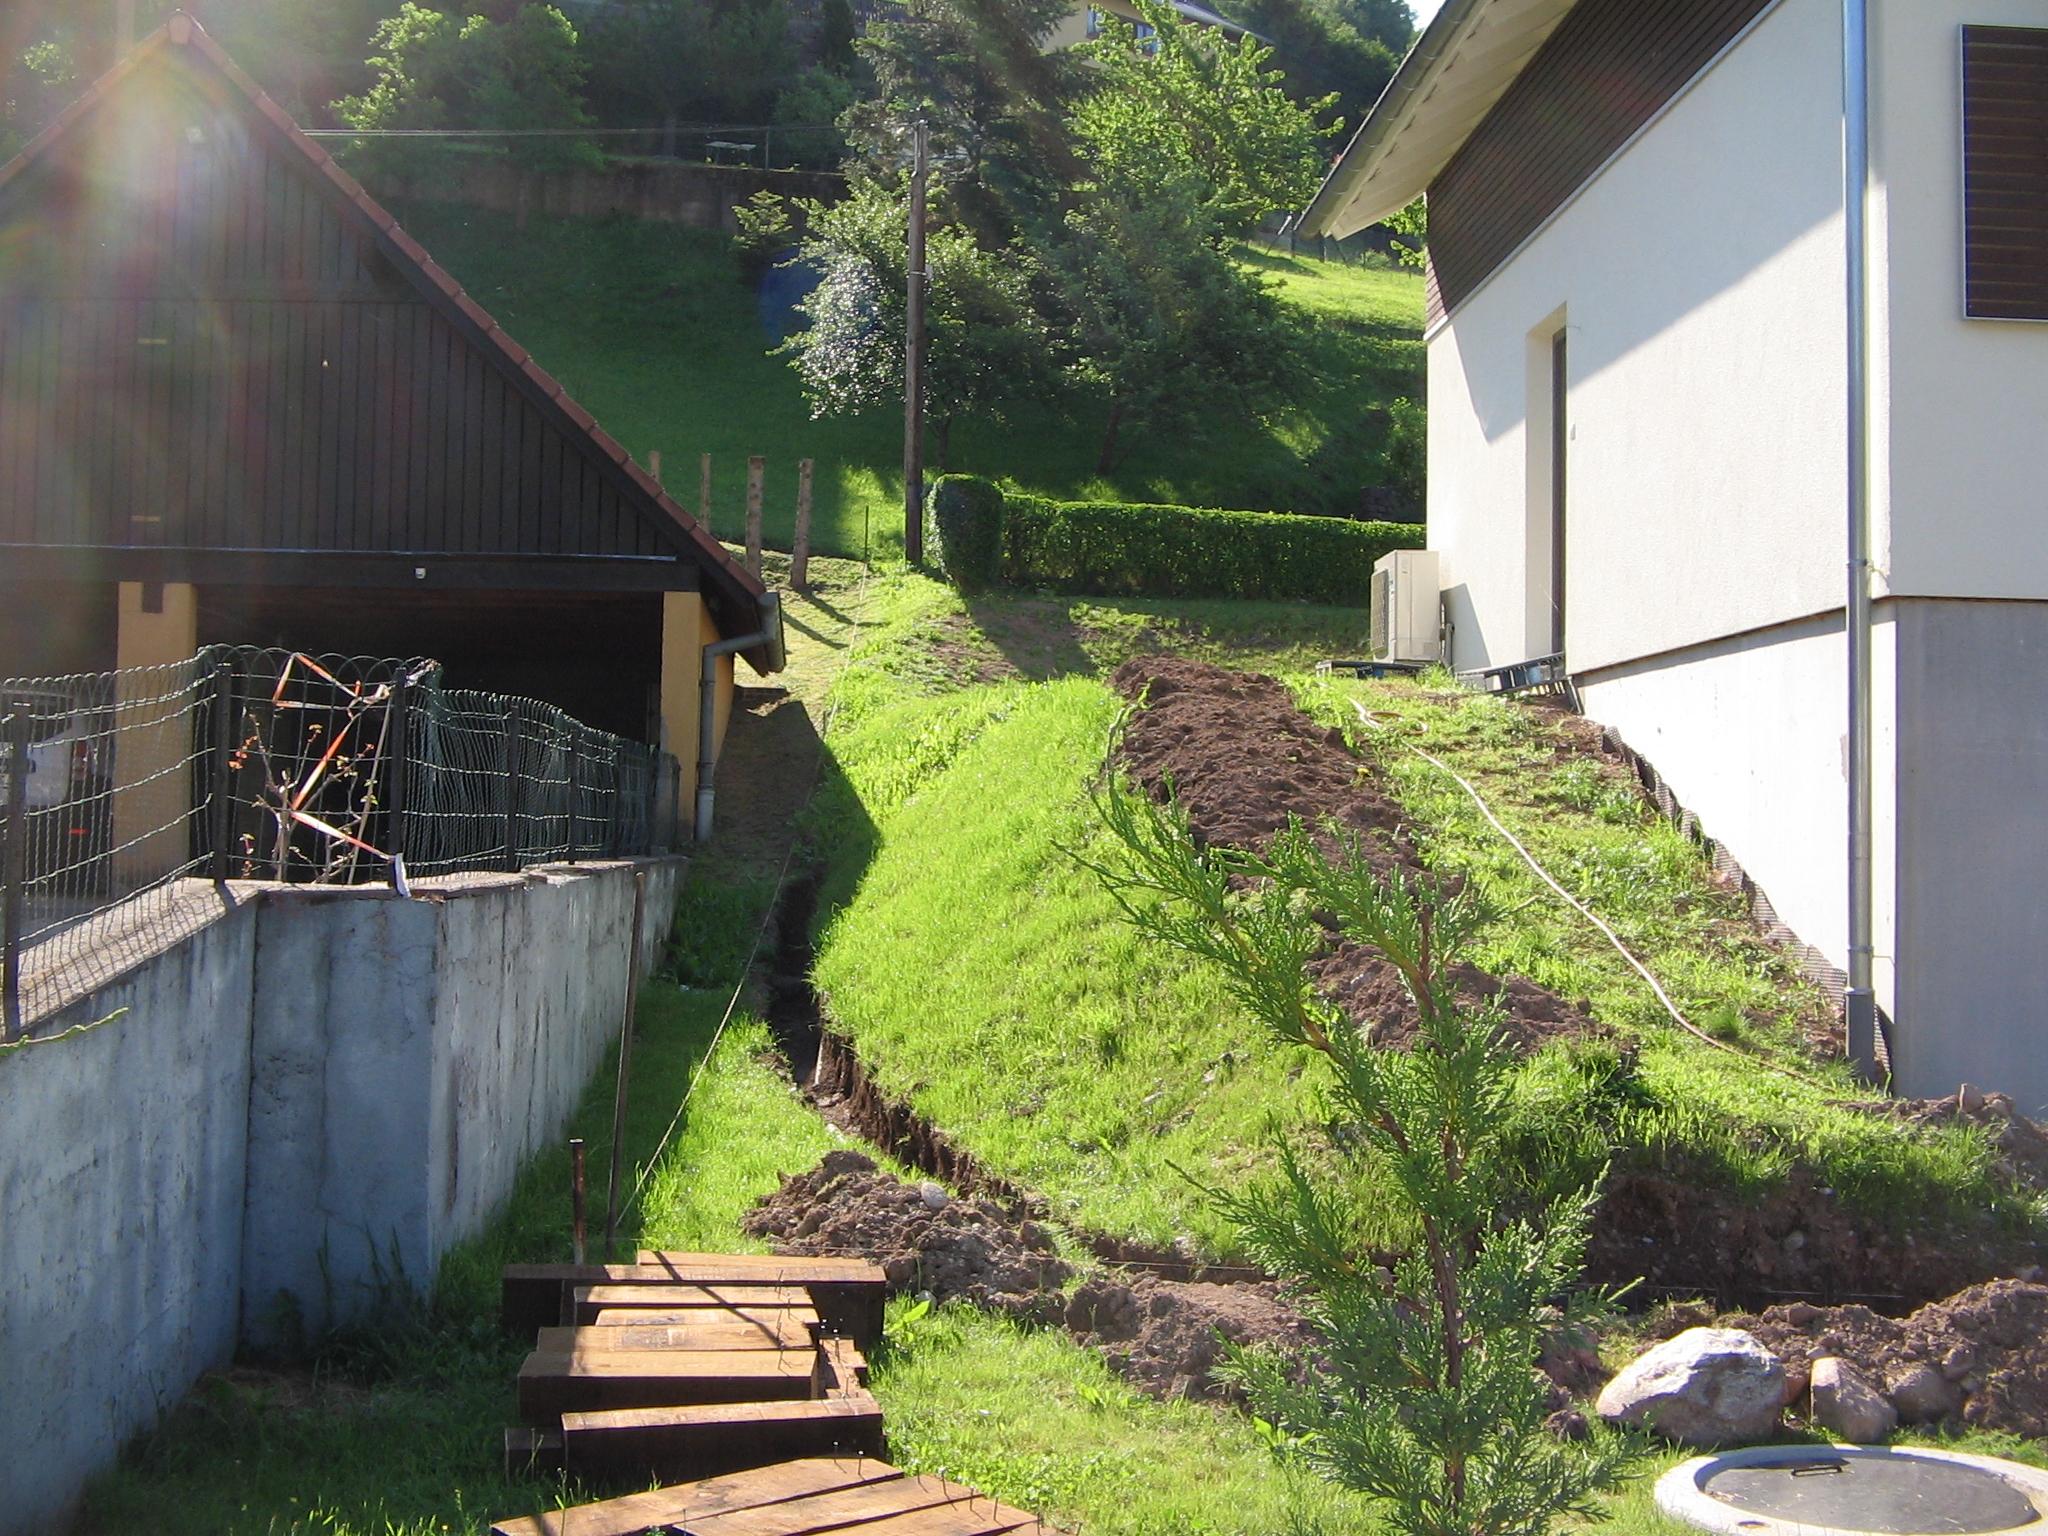 Escalier jardin bois cabane de jardin en bois habille de for Conception jardin brest